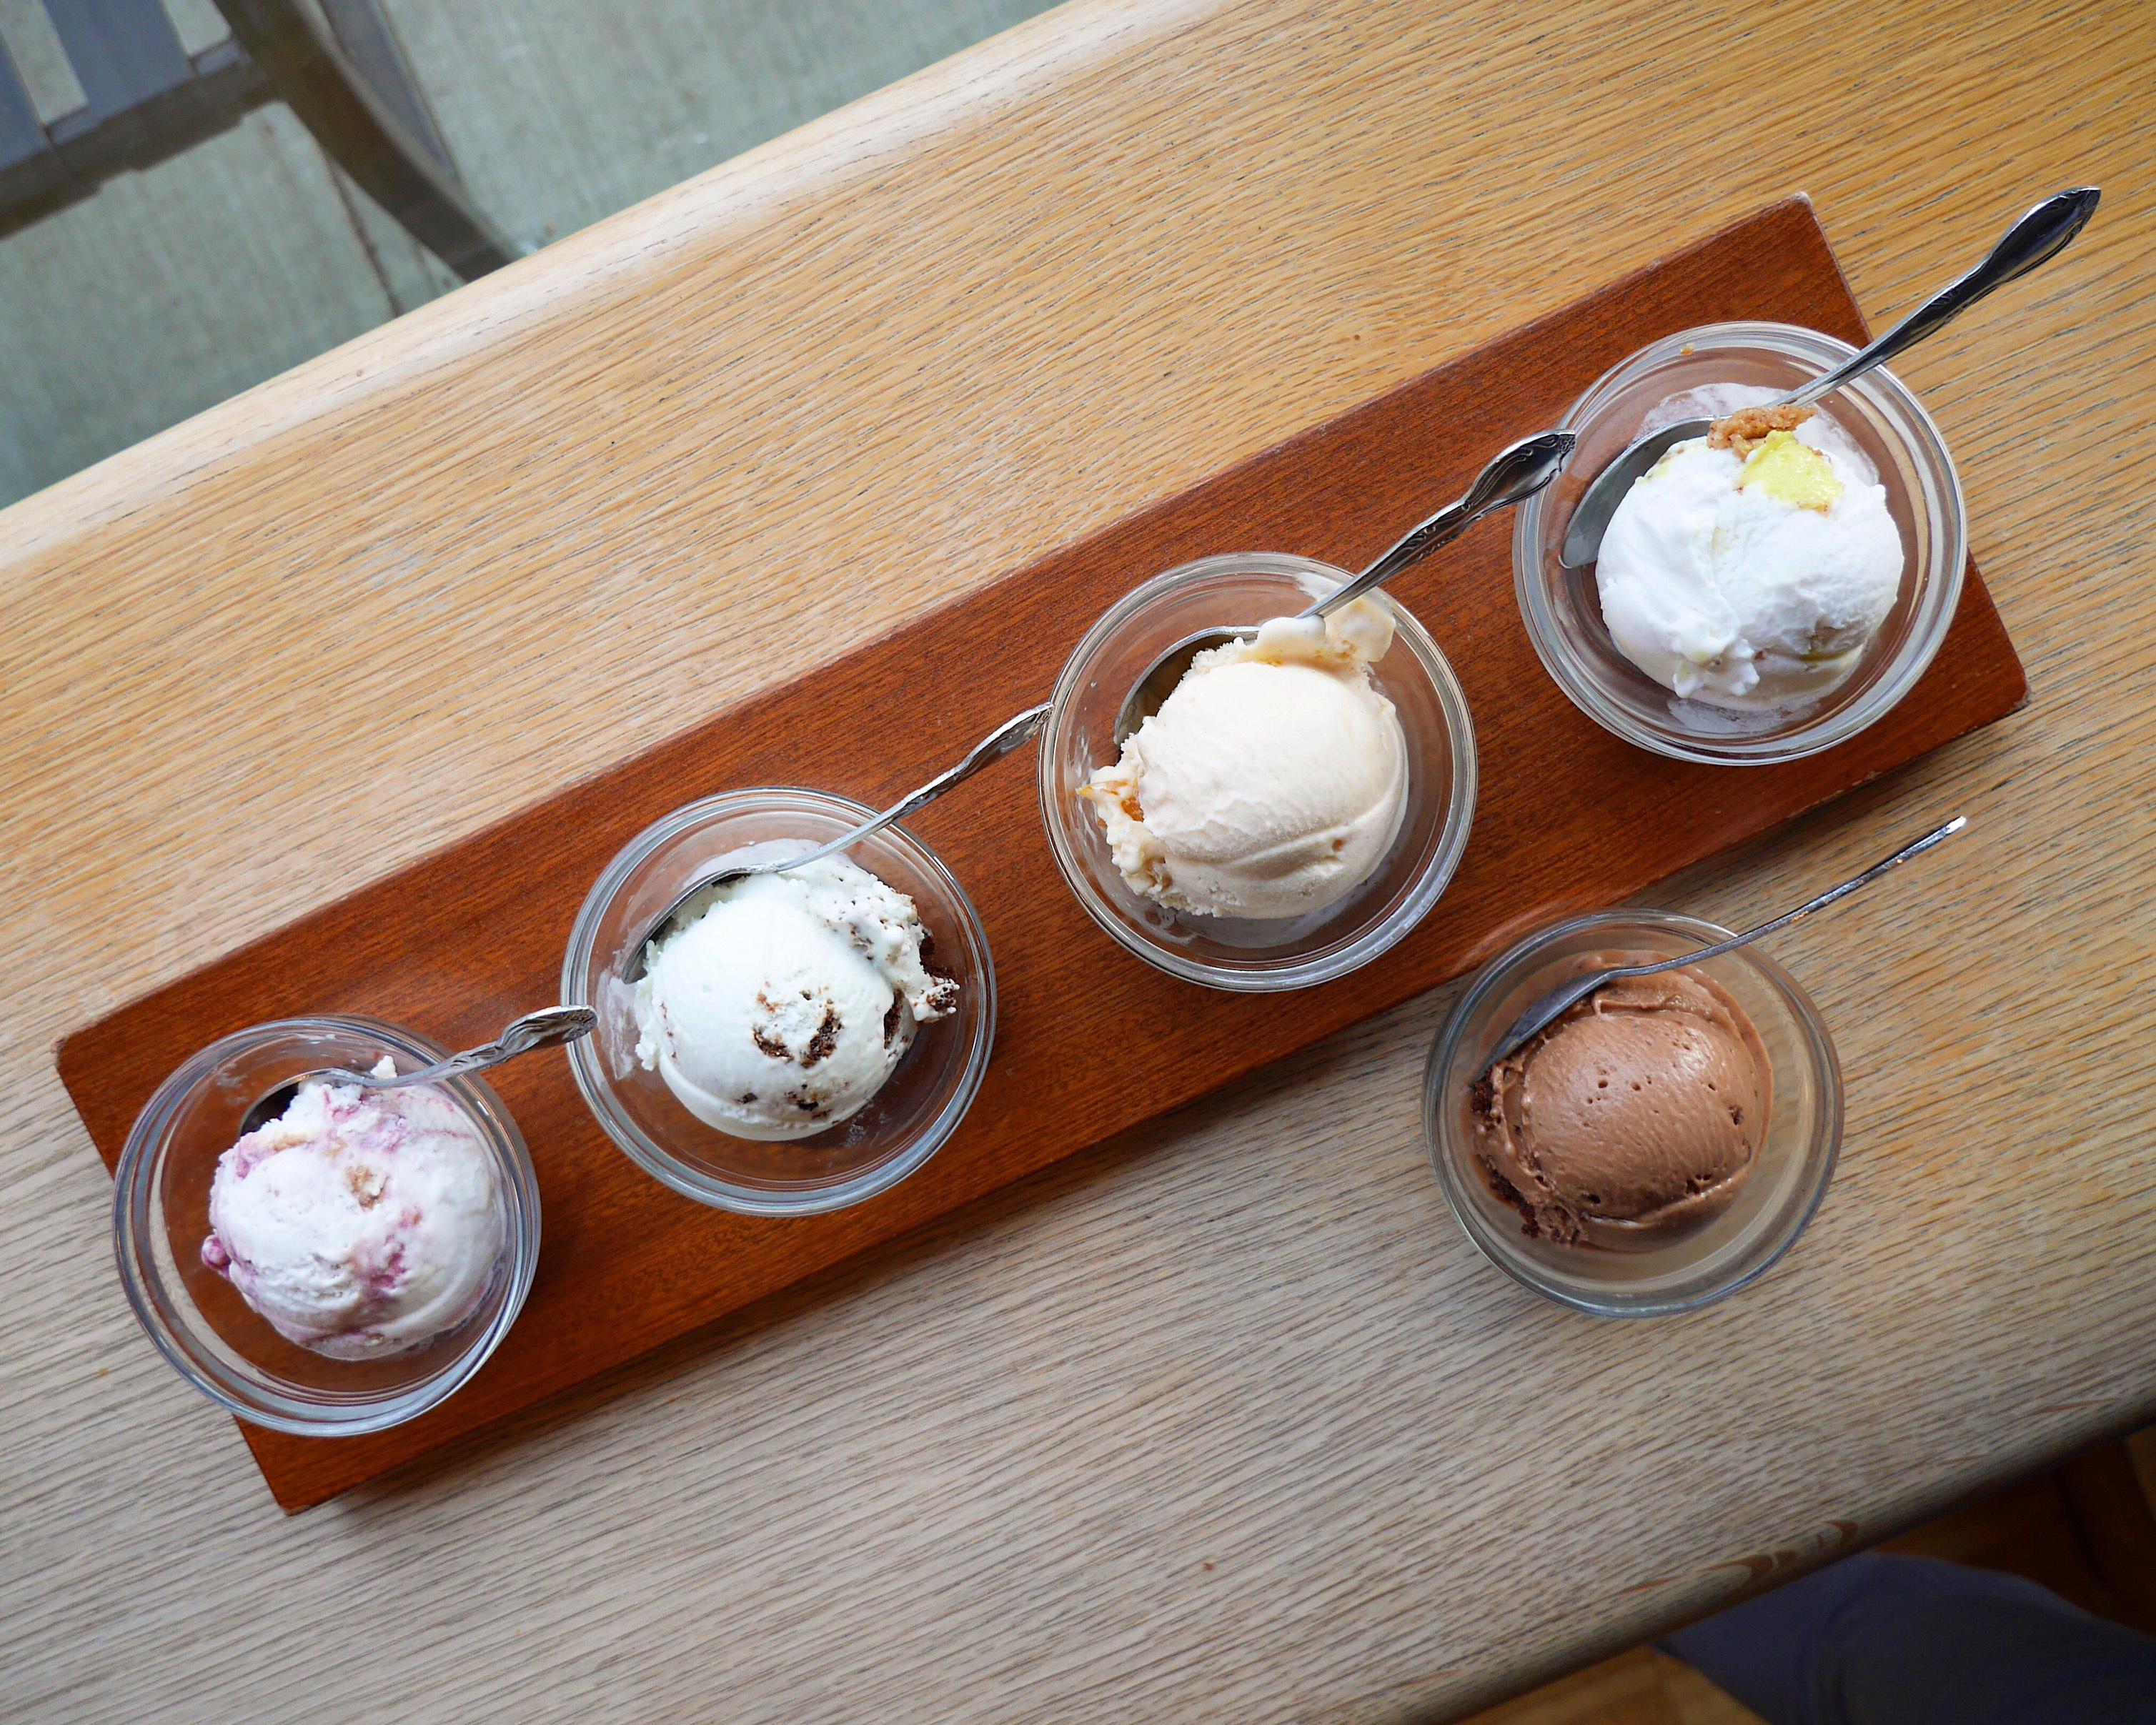 Salt & Straw ice cream flight